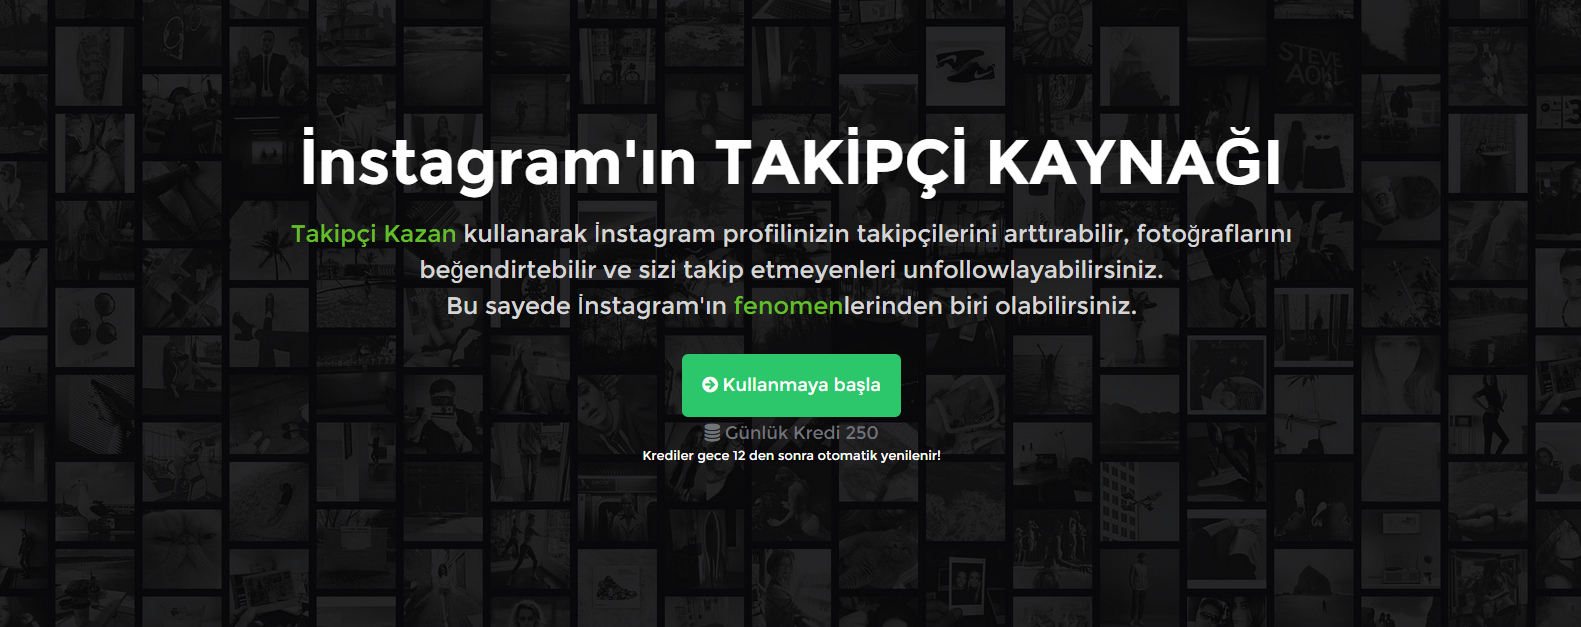 instagram-takipci-panel-scripti